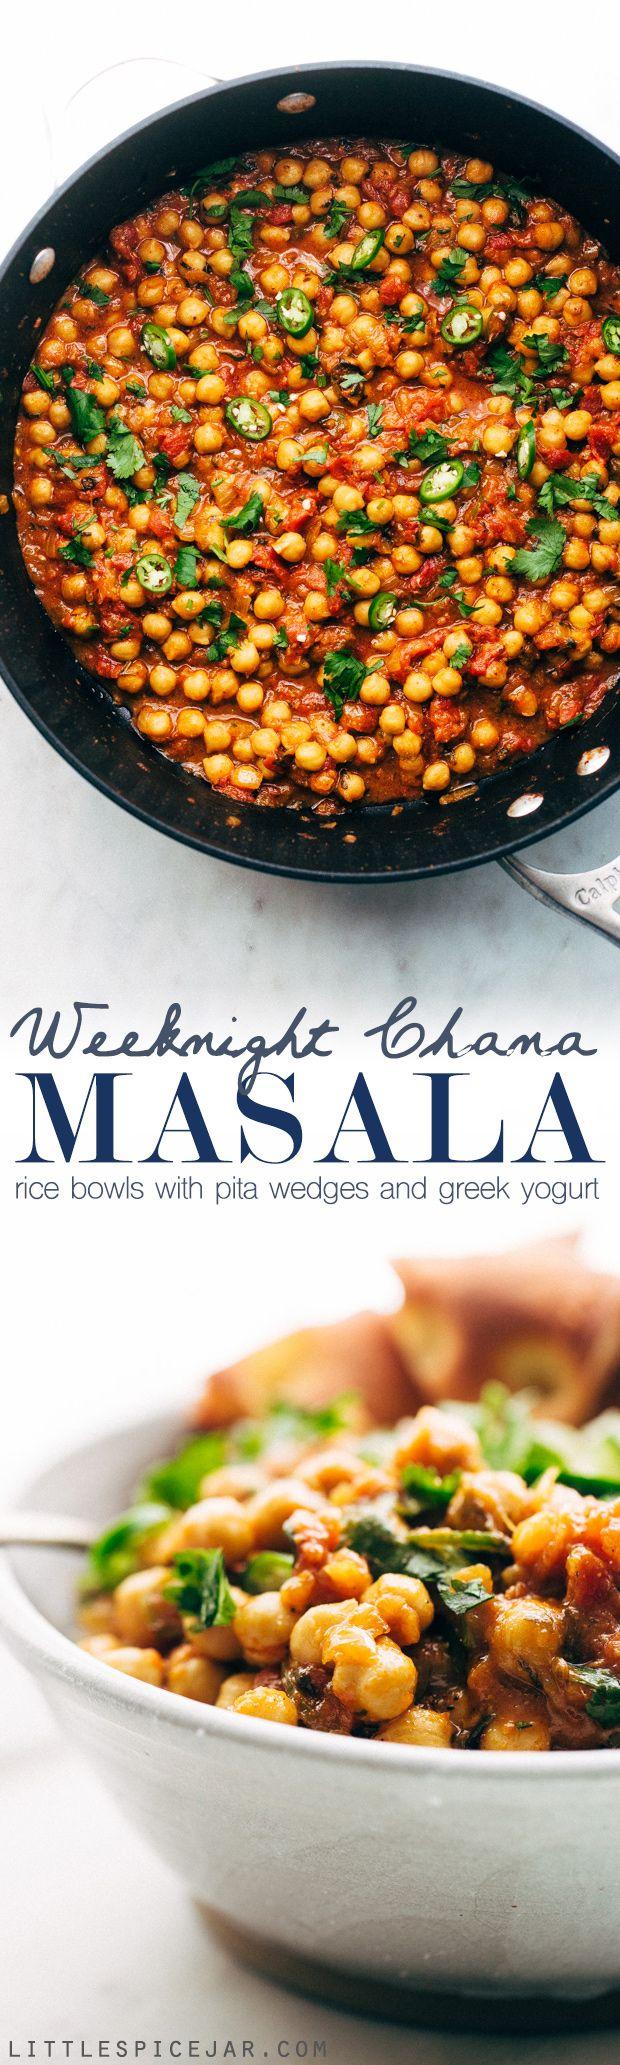 Weeknight Chana Masala Rice Bowls - A quick weeknight take on the traditional Chana Masala! Serve over basmati rice and it's the perfect warm and cozy winter meal! #chanamasala #indianfood #chana #vegan | Littlespicejar.com